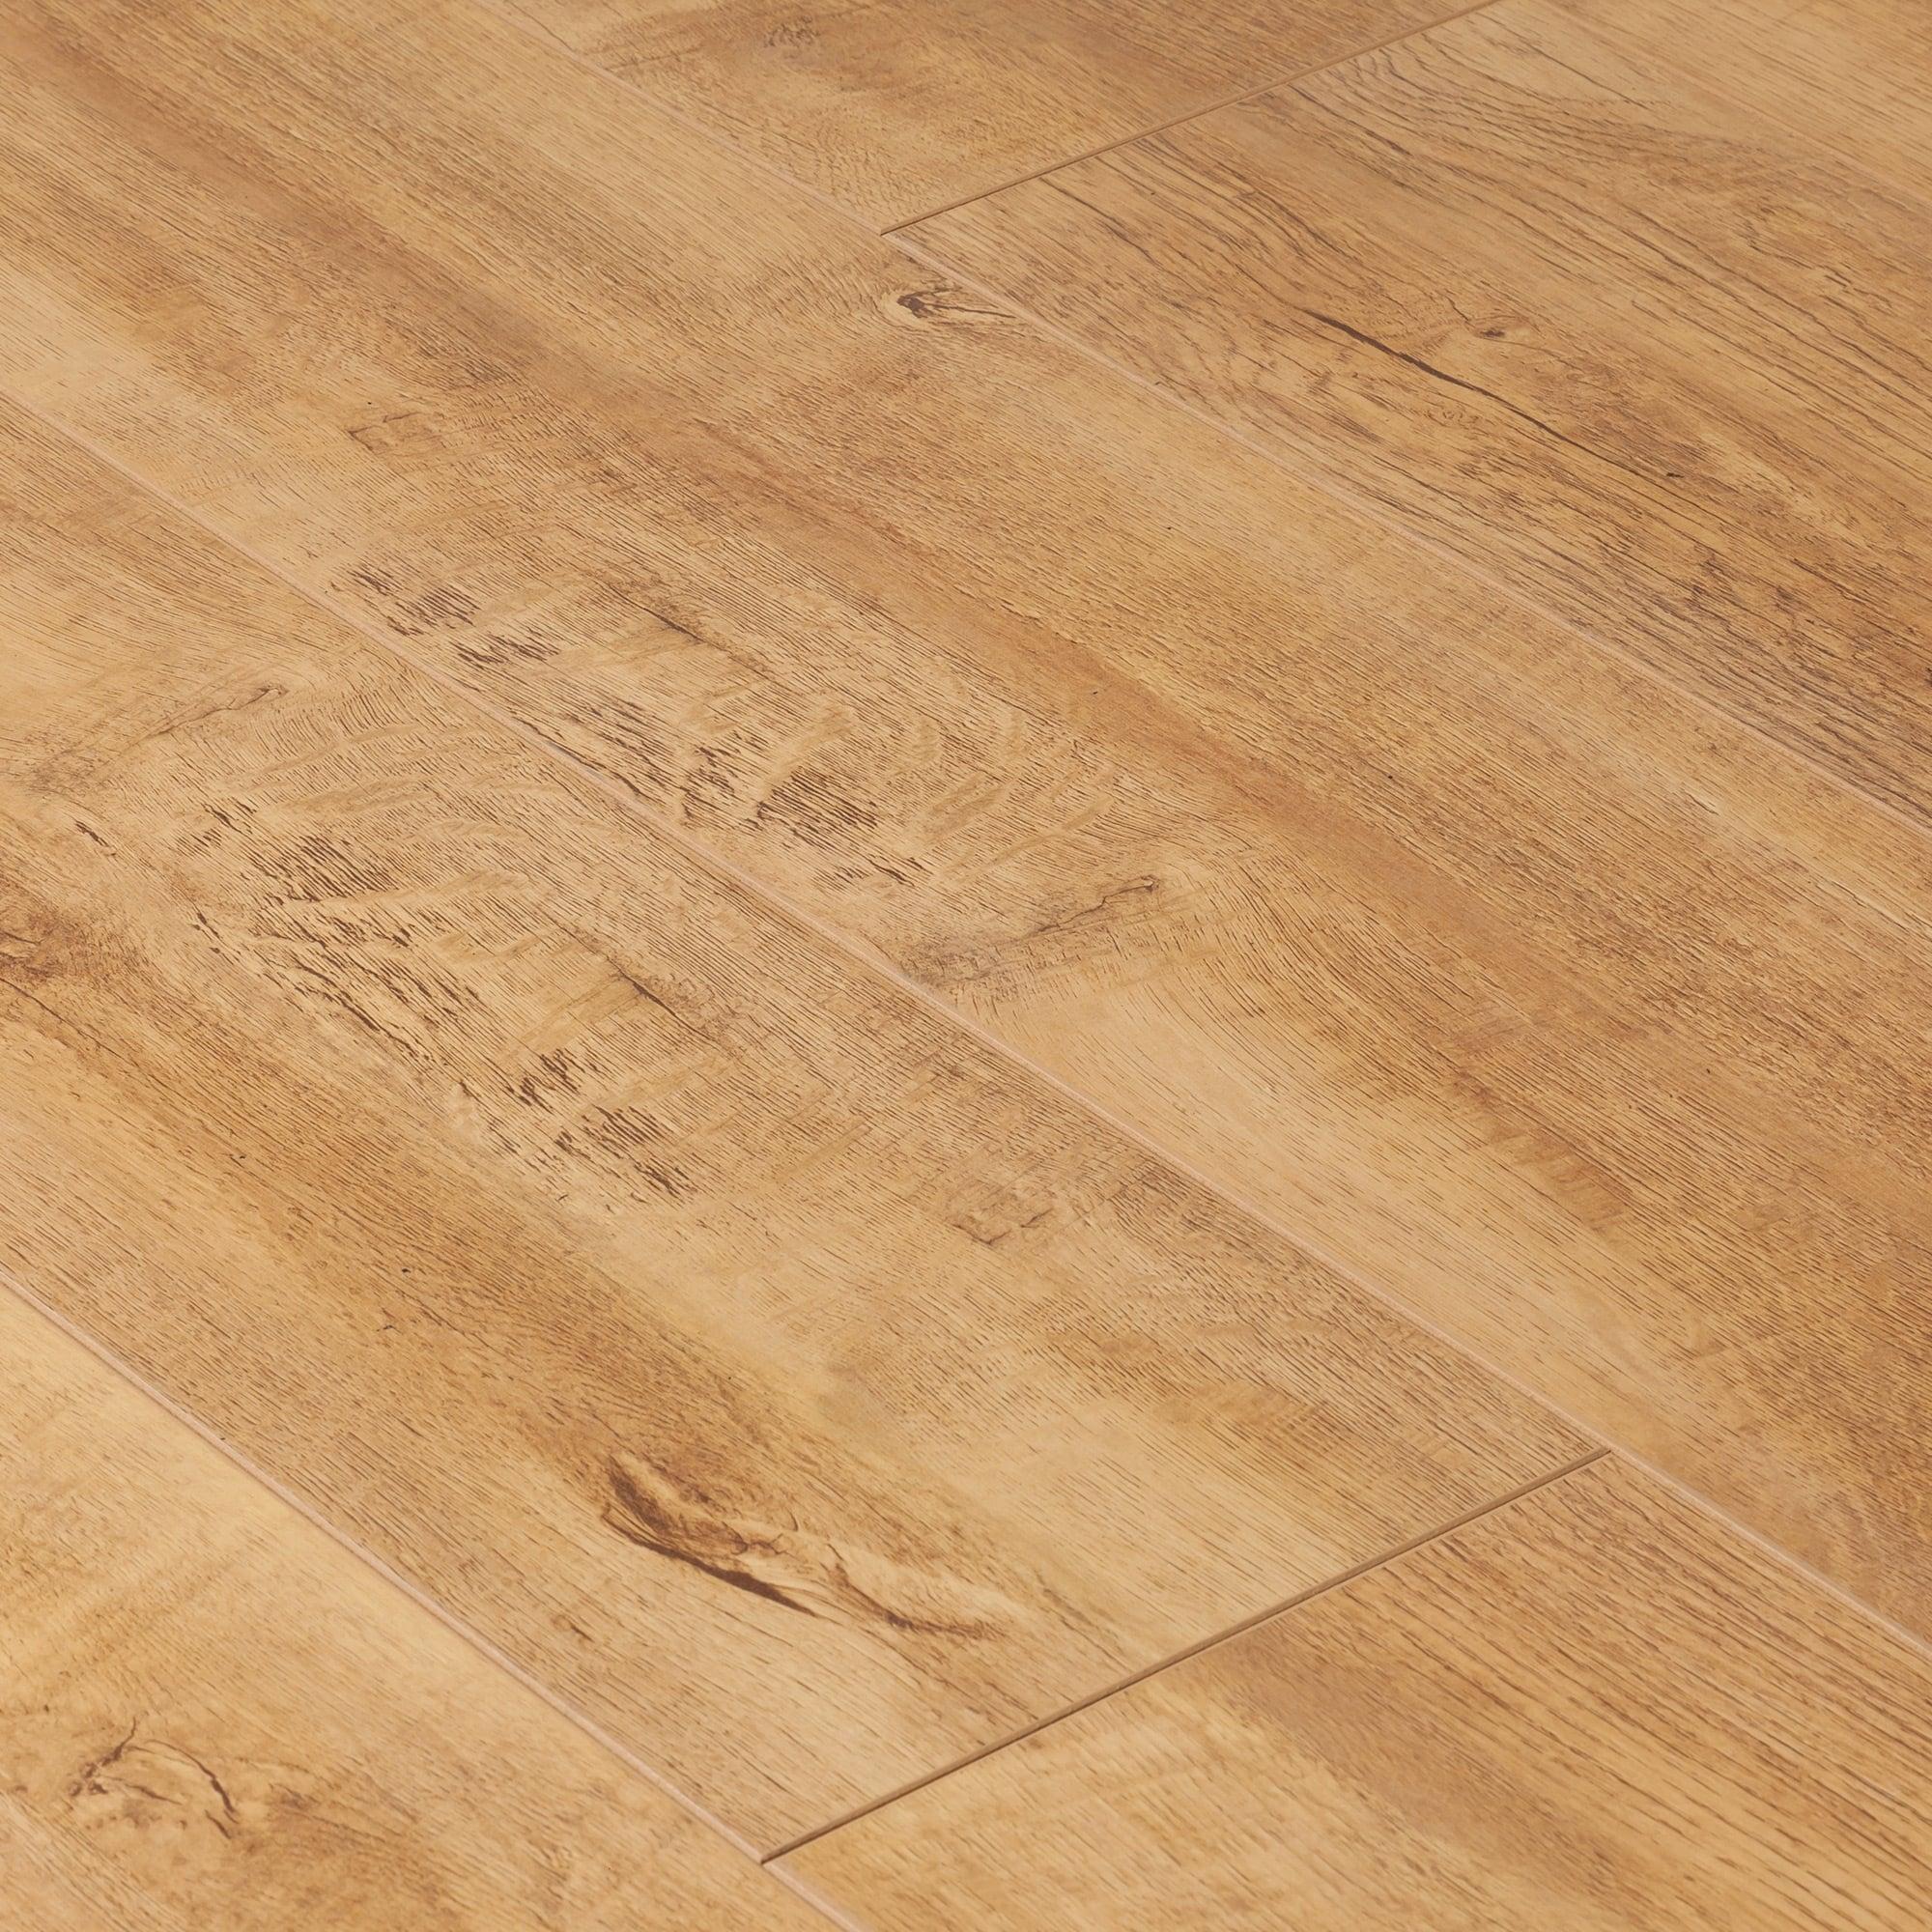 Krono original cottage twin clic 7mm harvester oak for Clic laminate flooring